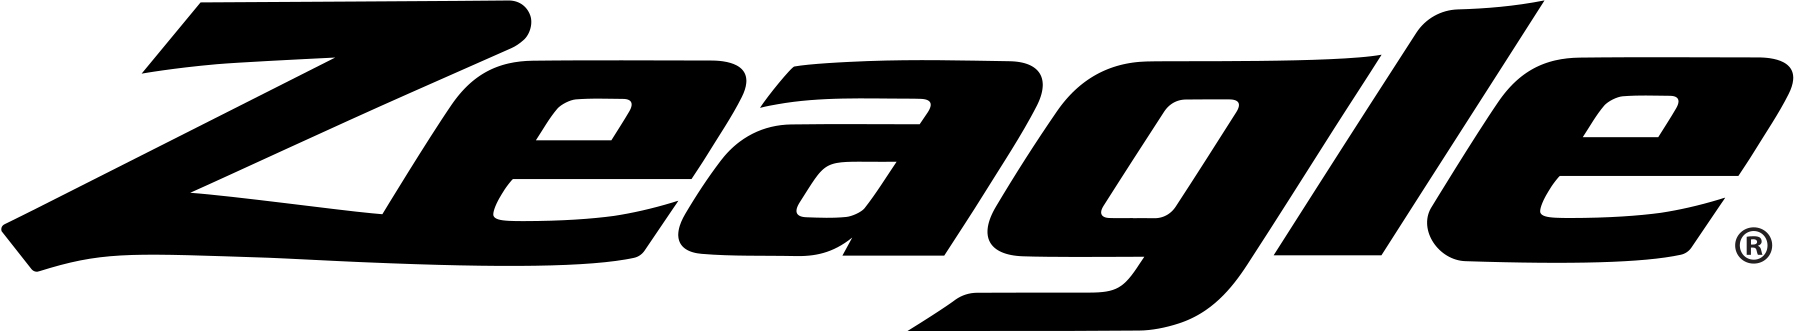 Zeagle Logo.jpg